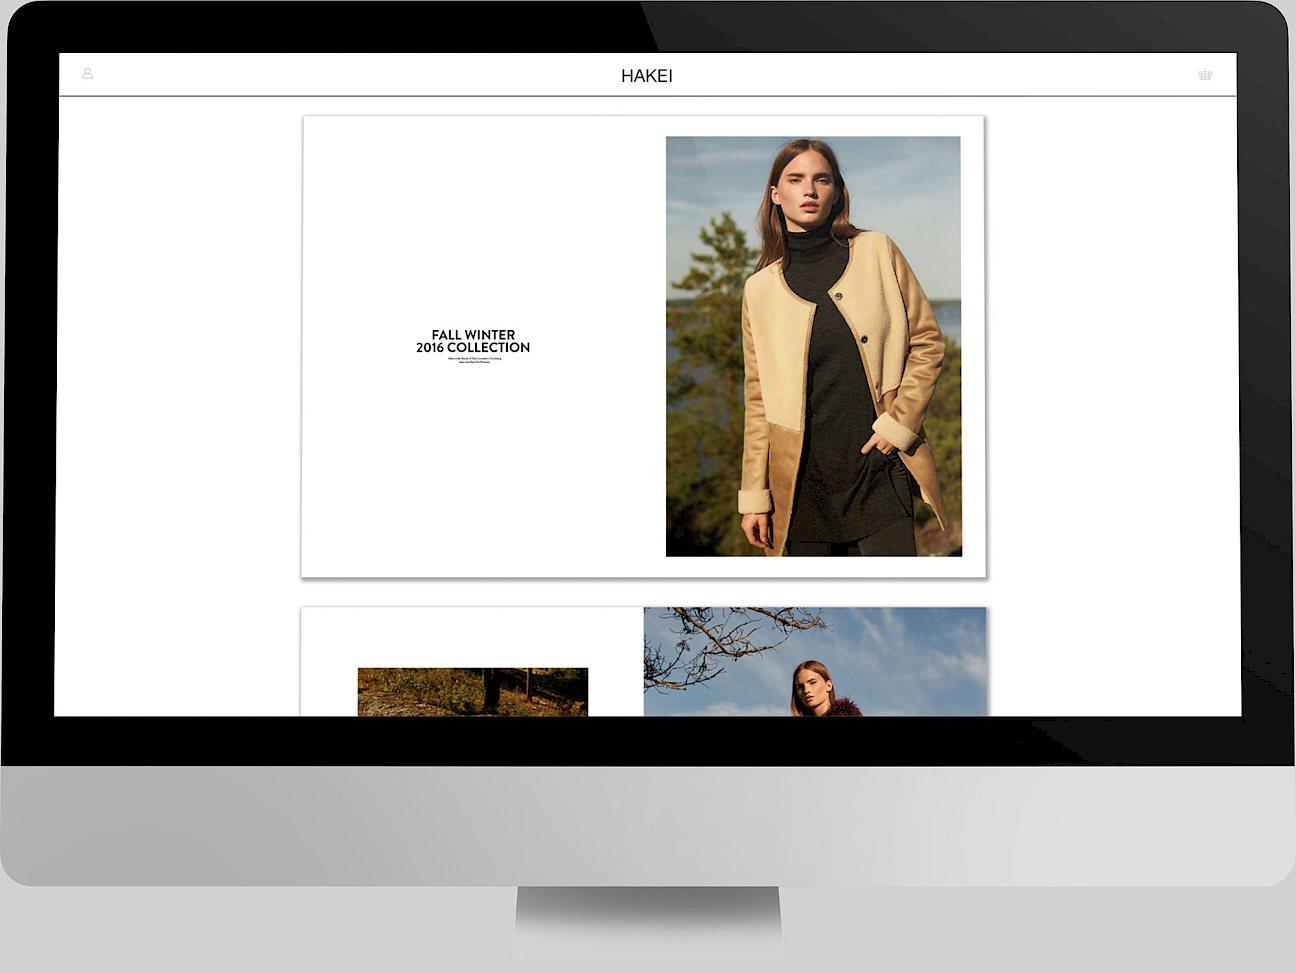 branding design 02 move digital fashion website hakei web